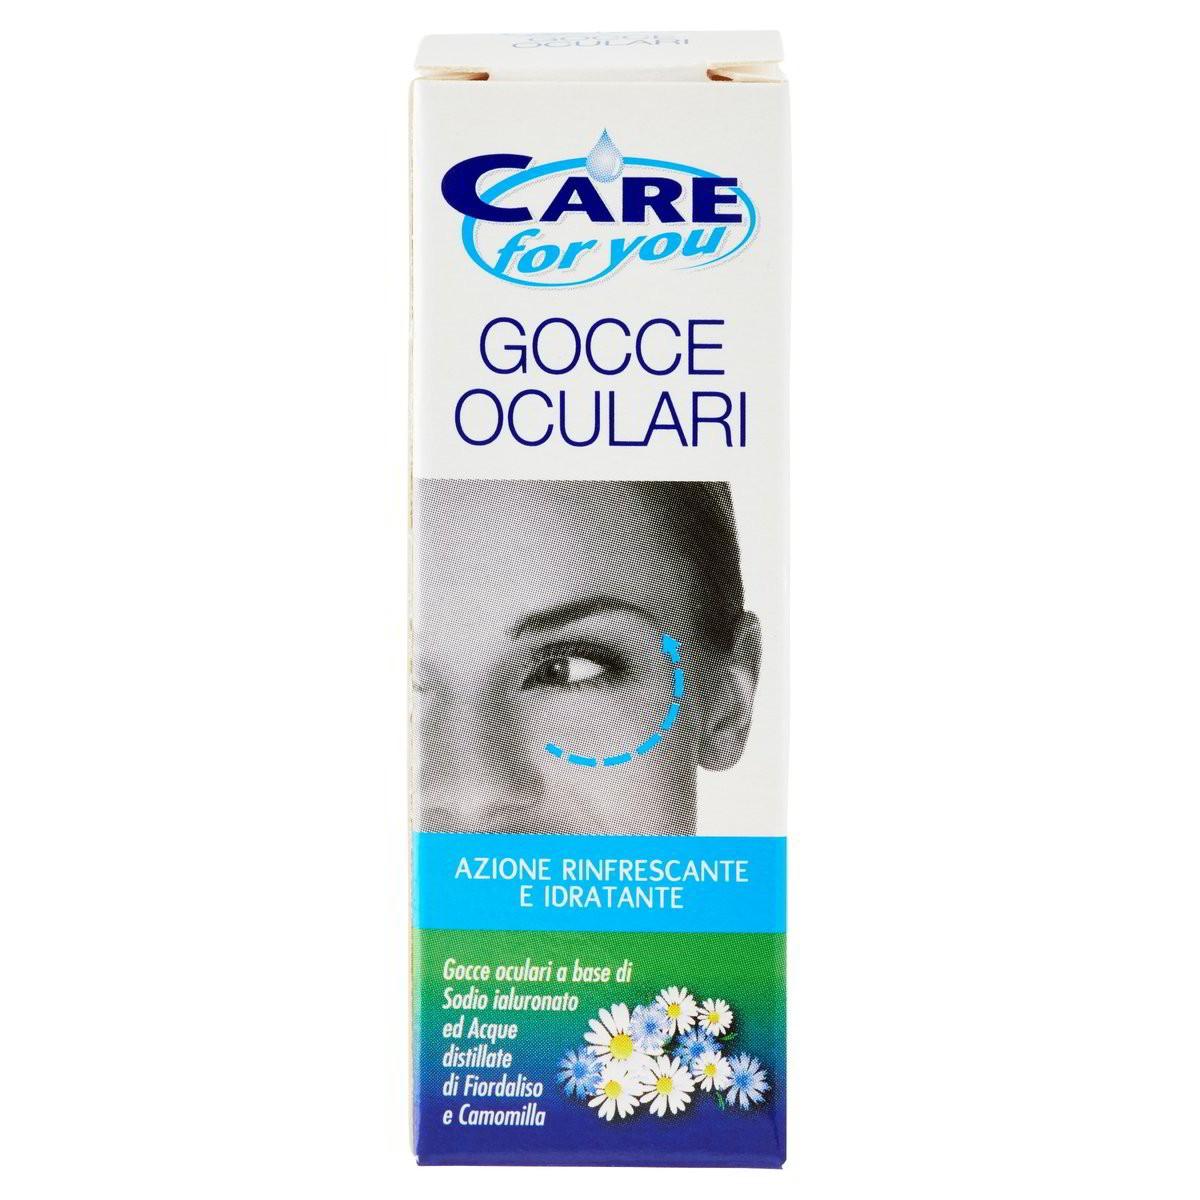 Care for You Gocce oculari